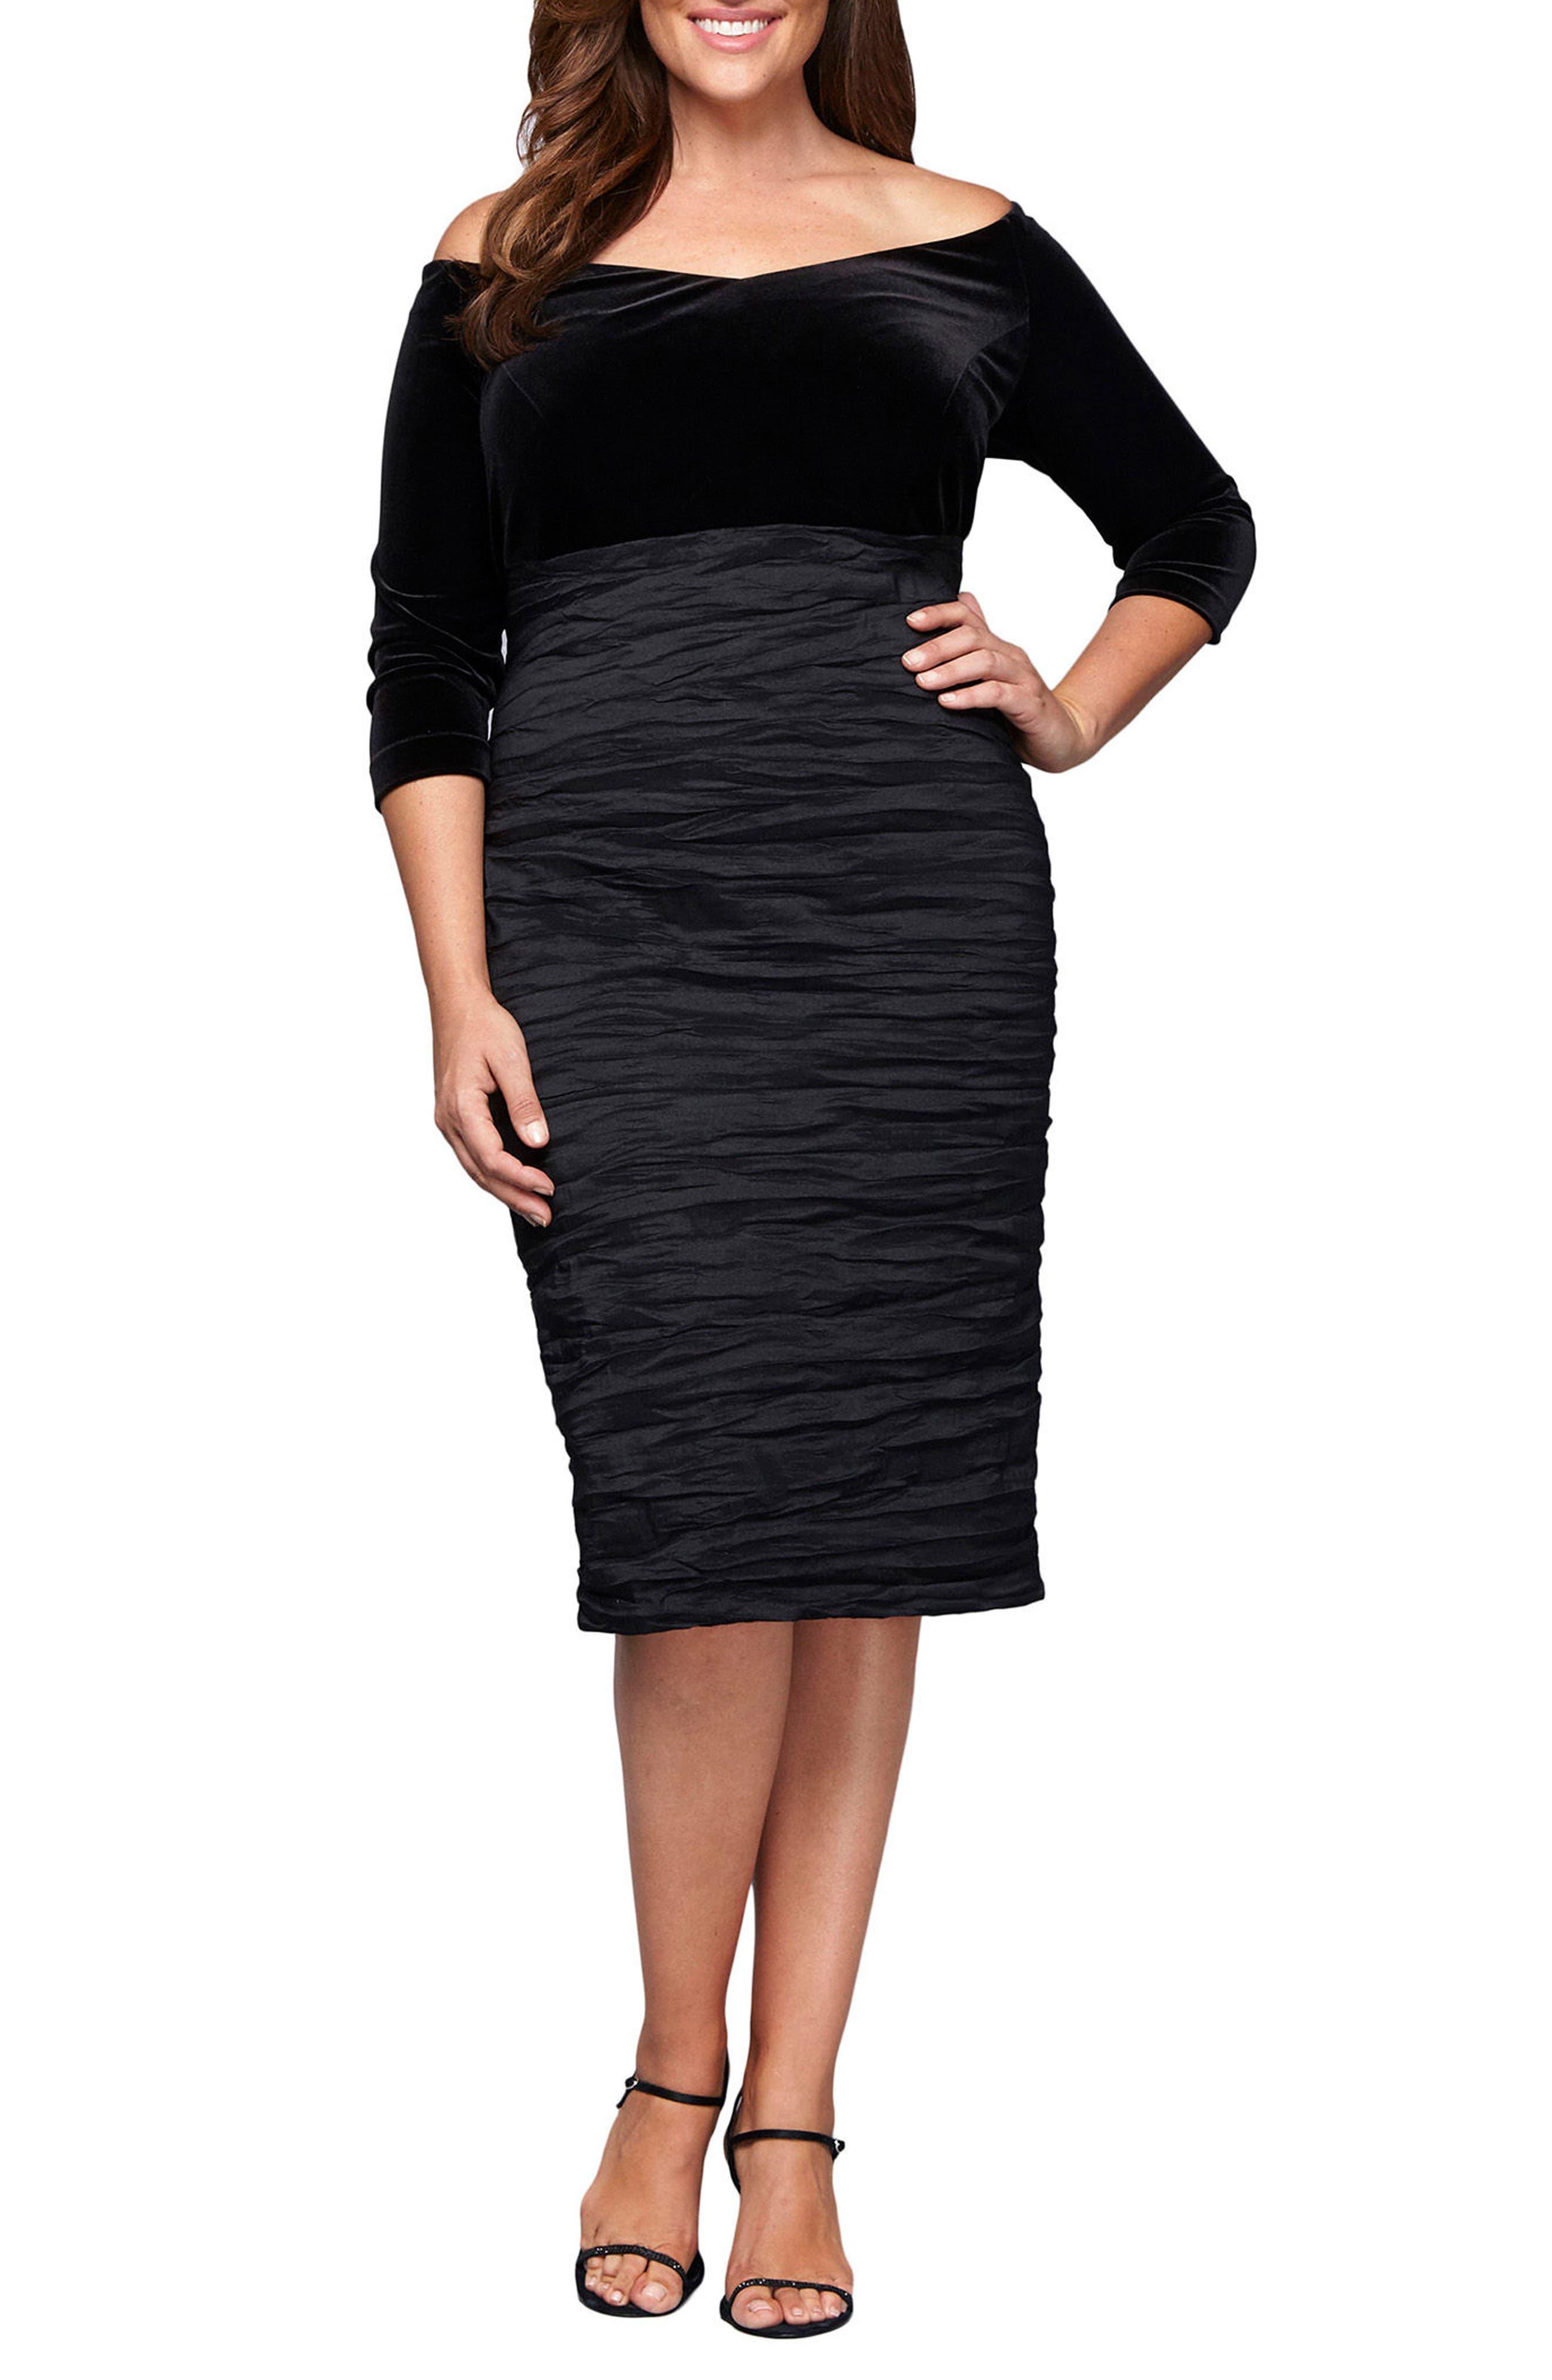 Alternate Image 1 Selected - Alex Evenings Velvet Bodice Sheath Dress (Plus Size)